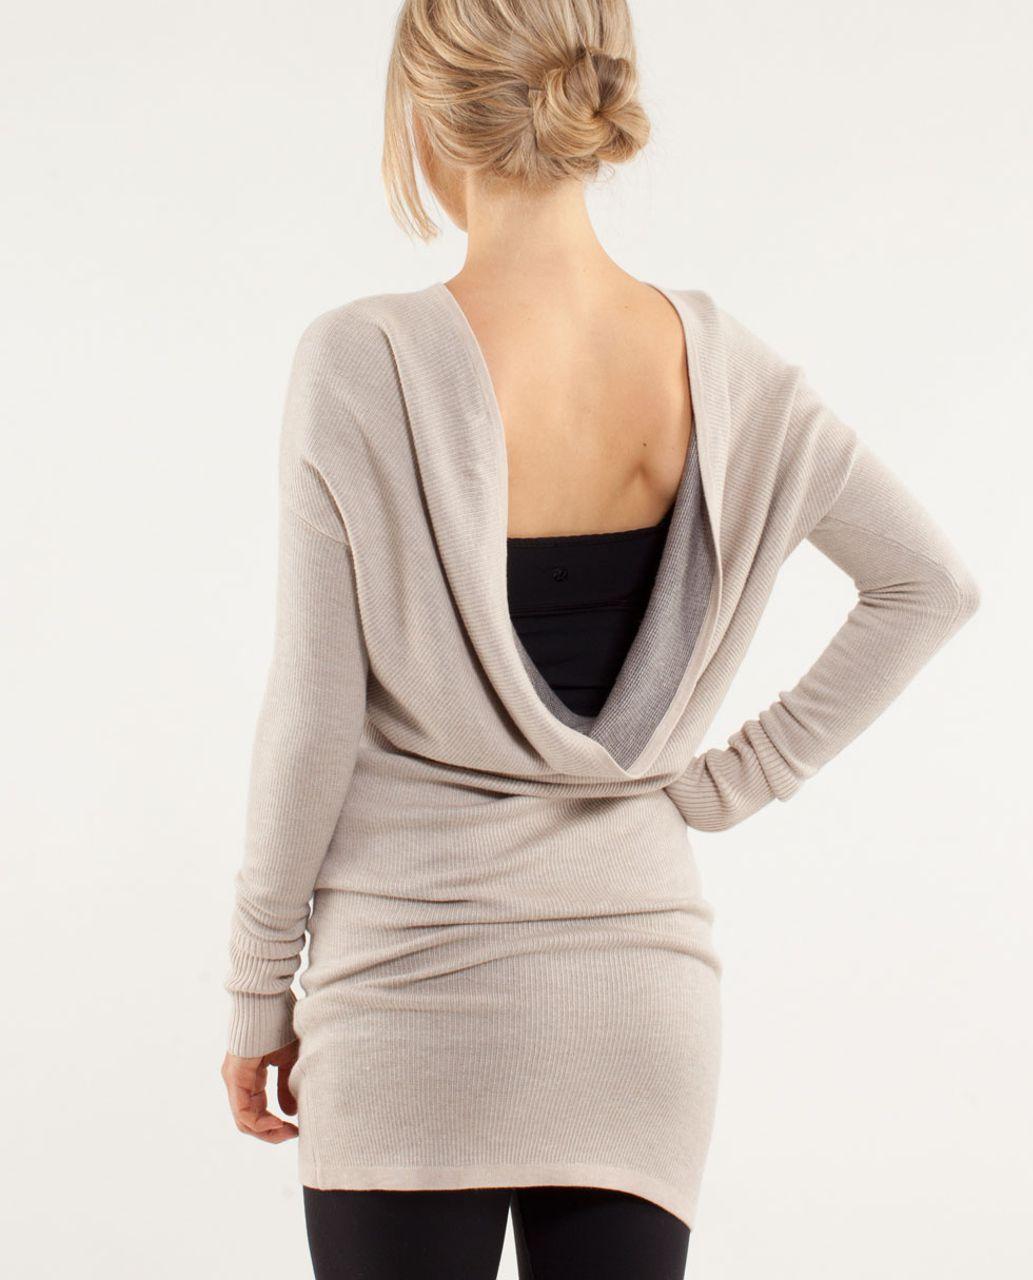 f3650ad5a8b Lululemon Serenity Sweater Wrap - Heathered Cashew   Coal - lulu fanatics